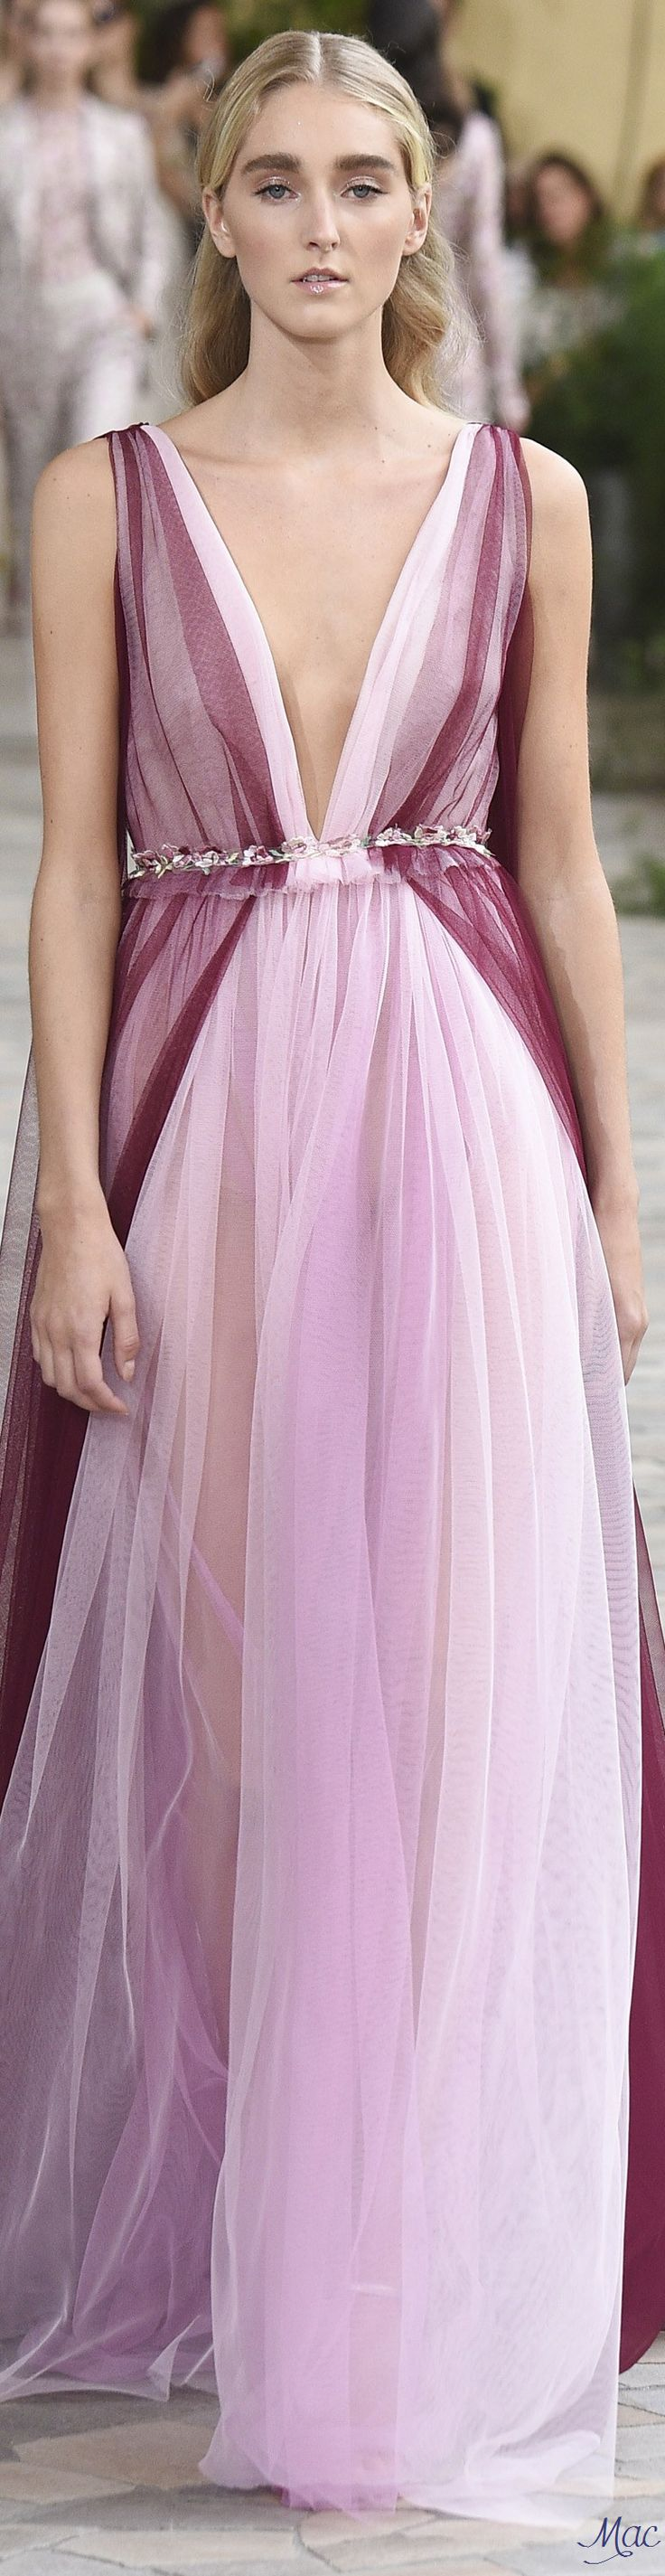 Spring 2017 Ready-to-Wear Luisa Beccaria jαɢlαdy